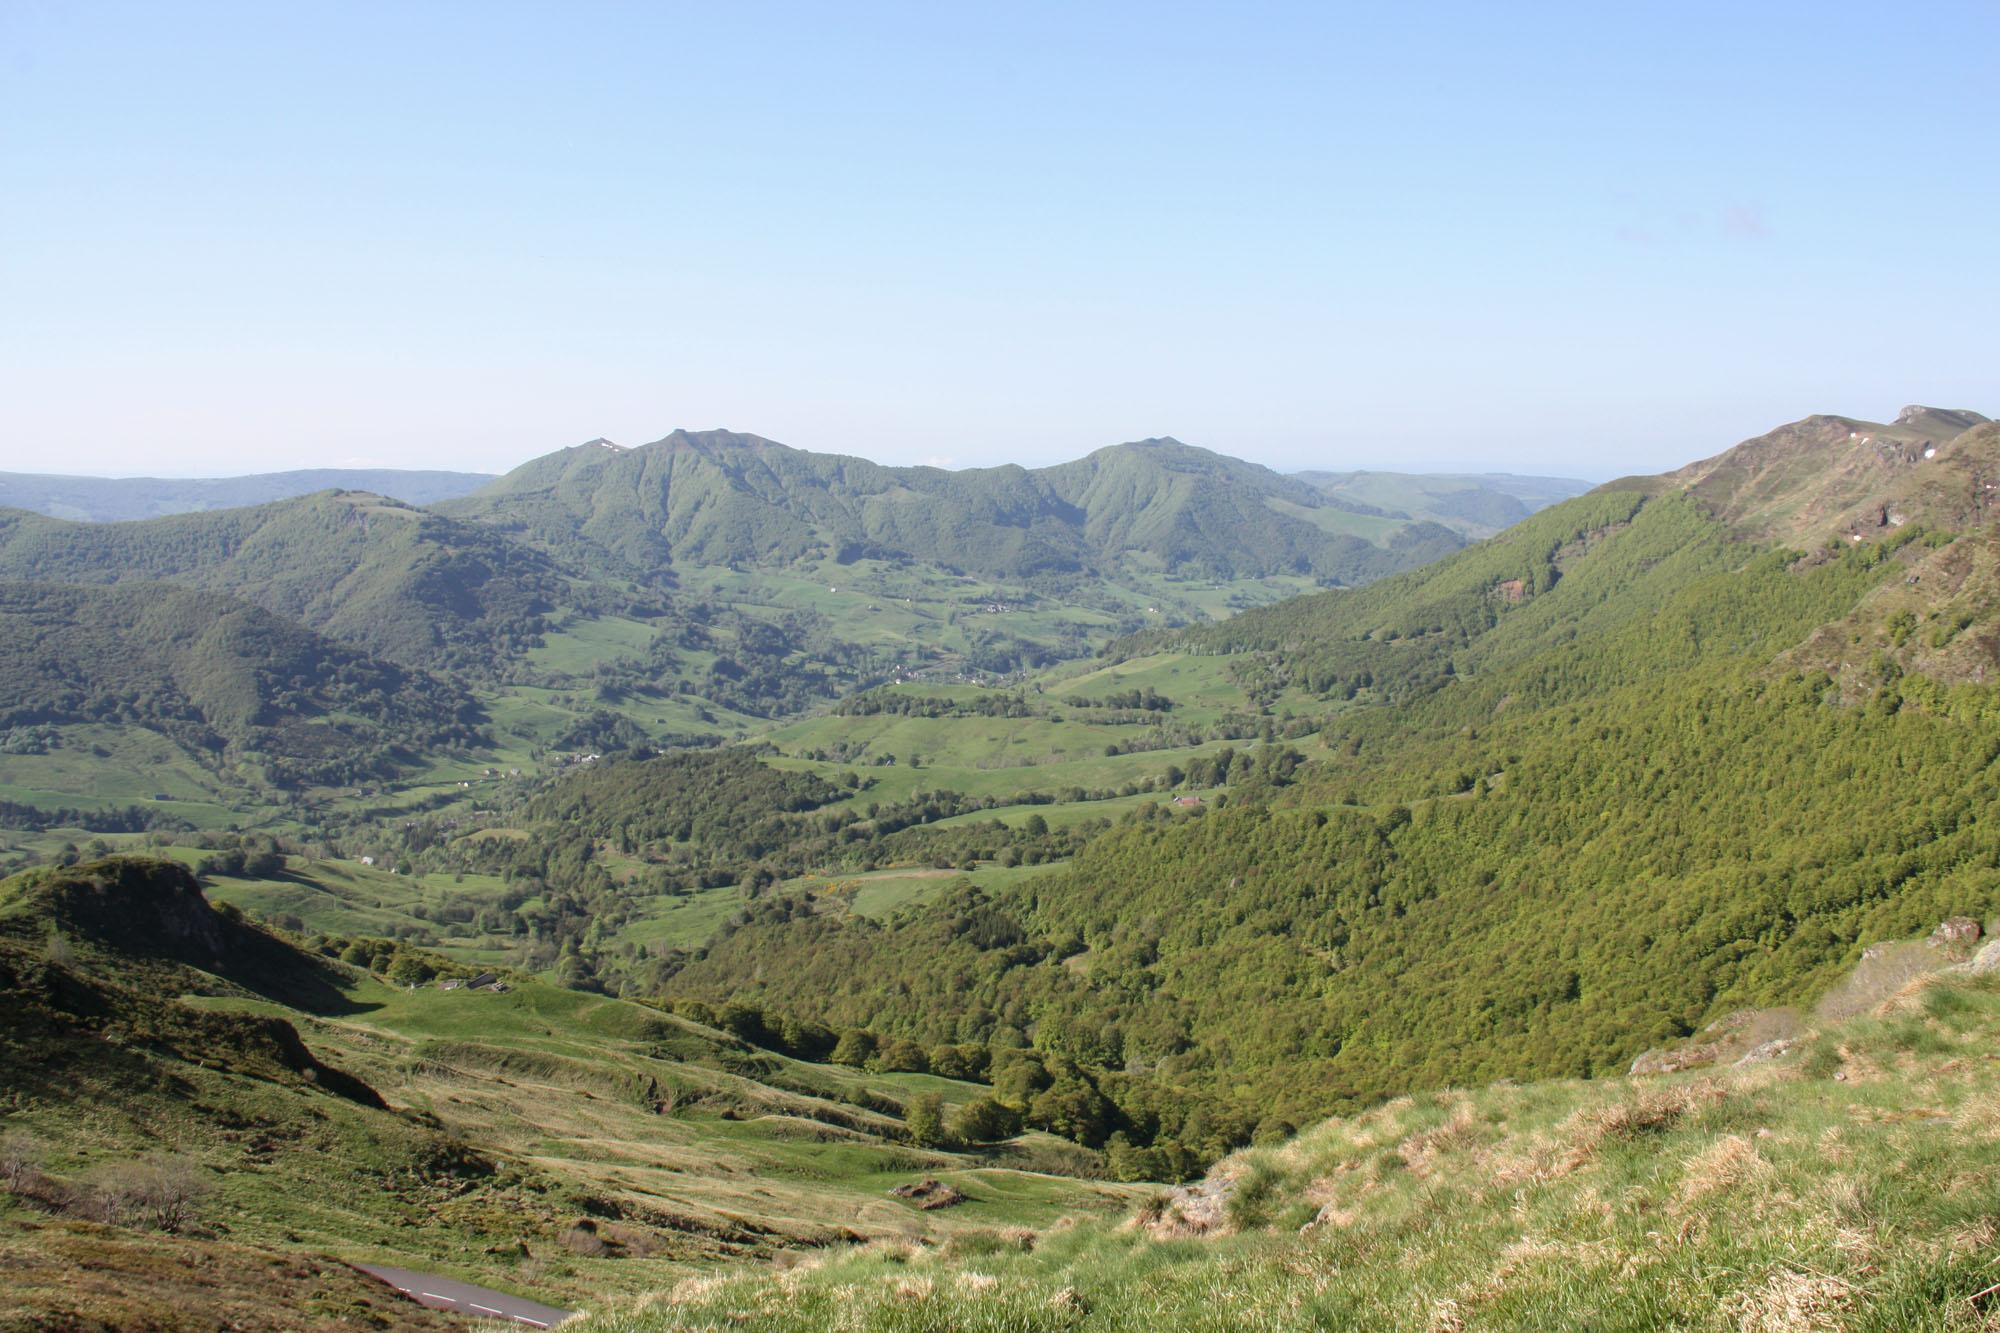 Vallée de la Jordanne: misschien wel het mooiste stukje Auvergne